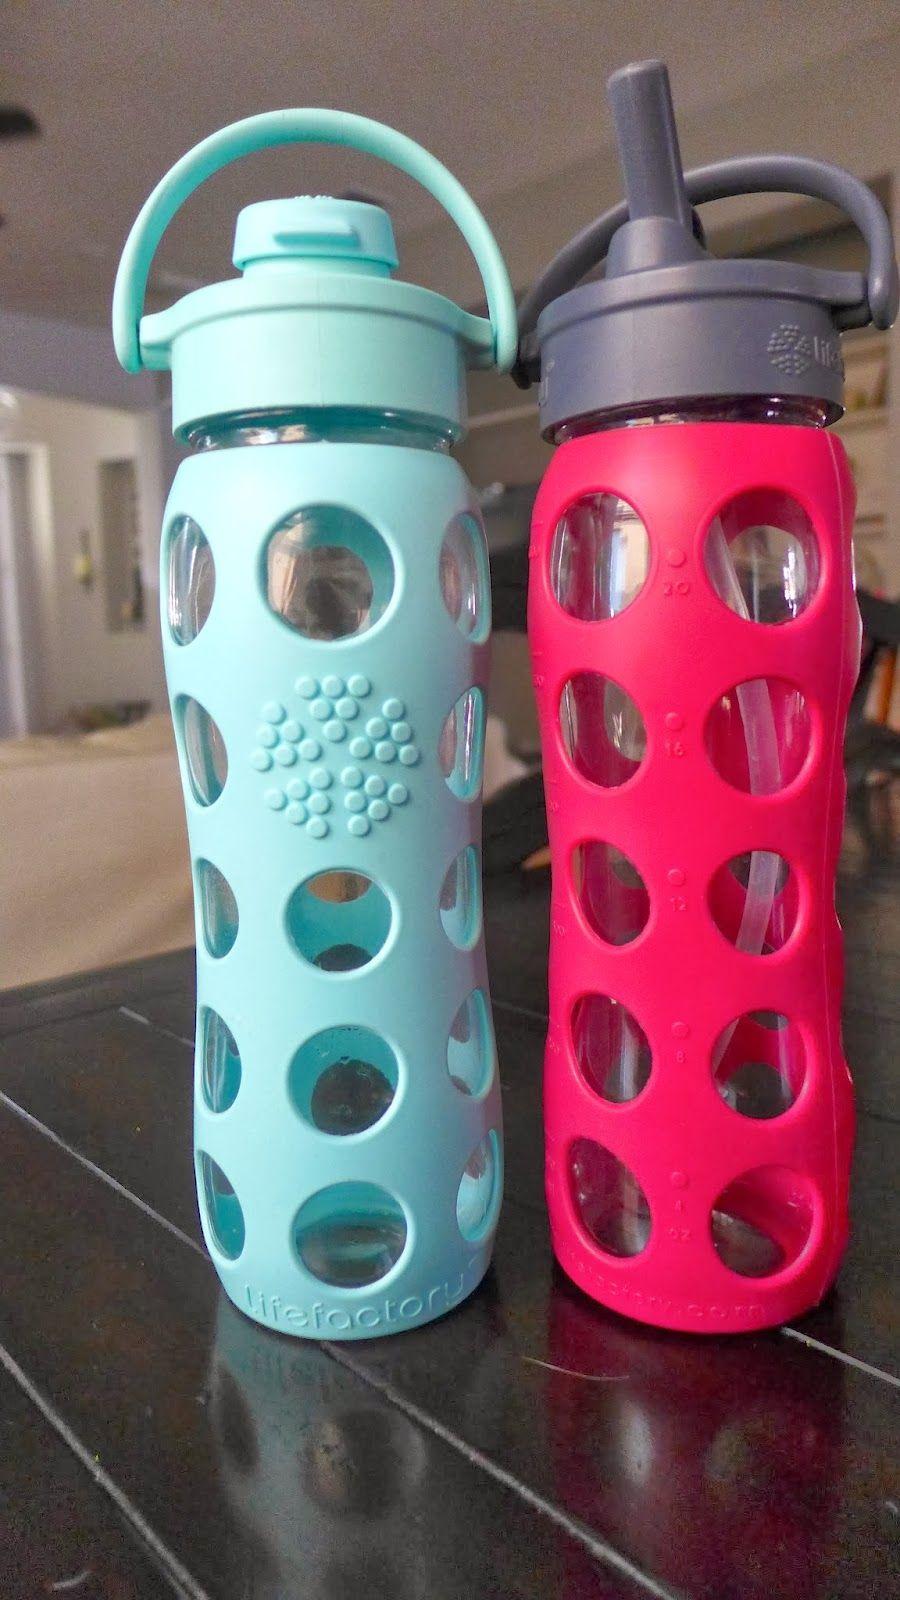 20oz aquaburst™ water bottle | Water bottles, Giveaway and Bottle